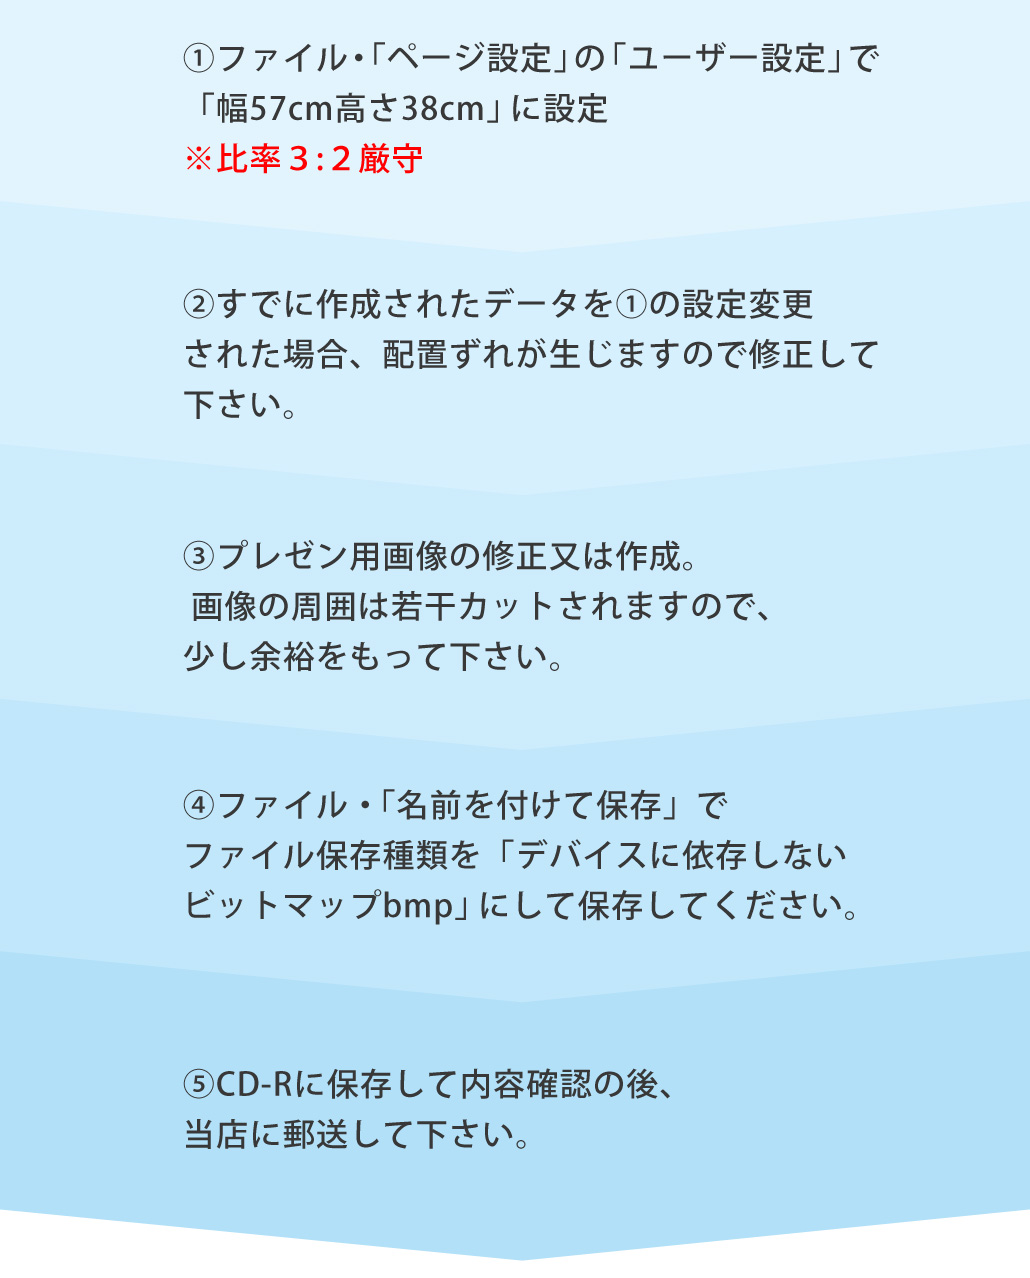 BMP_nagare